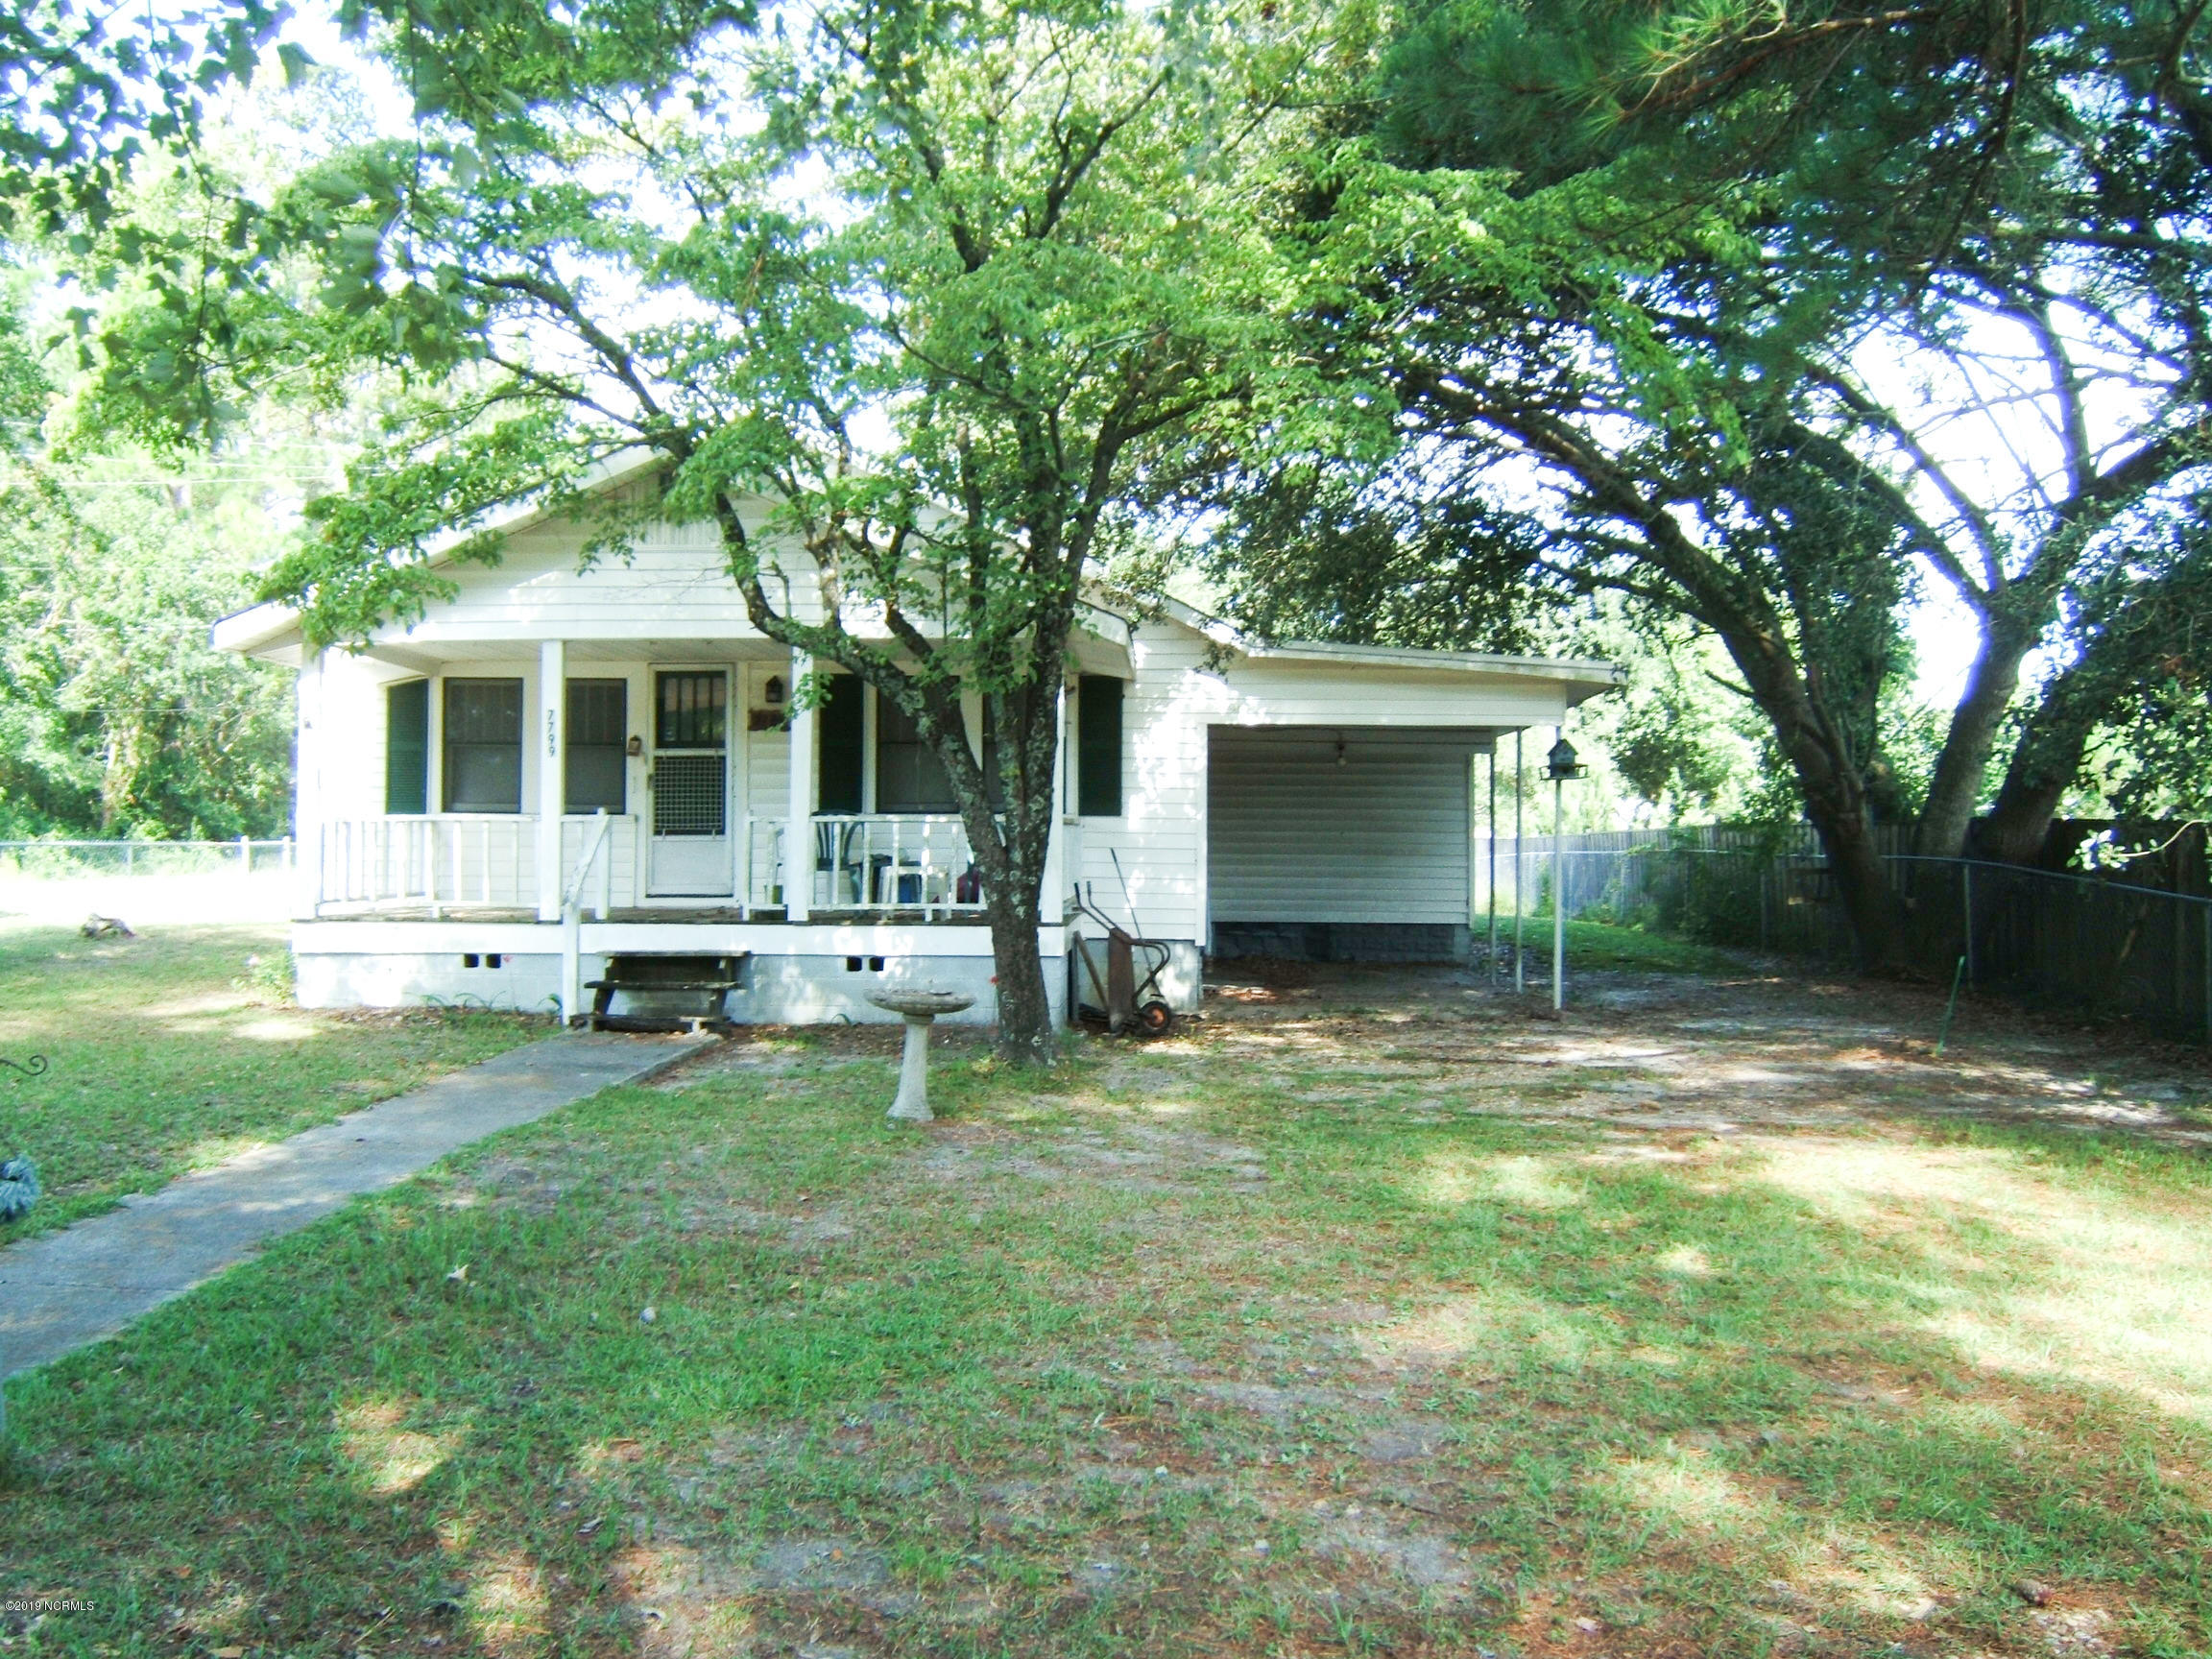 7799 Alexander Road, Wilmington, North Carolina 28411, 2 Bedrooms Bedrooms, 6 Rooms Rooms,1 BathroomBathrooms,Single family residence,For sale,Alexander,100184004